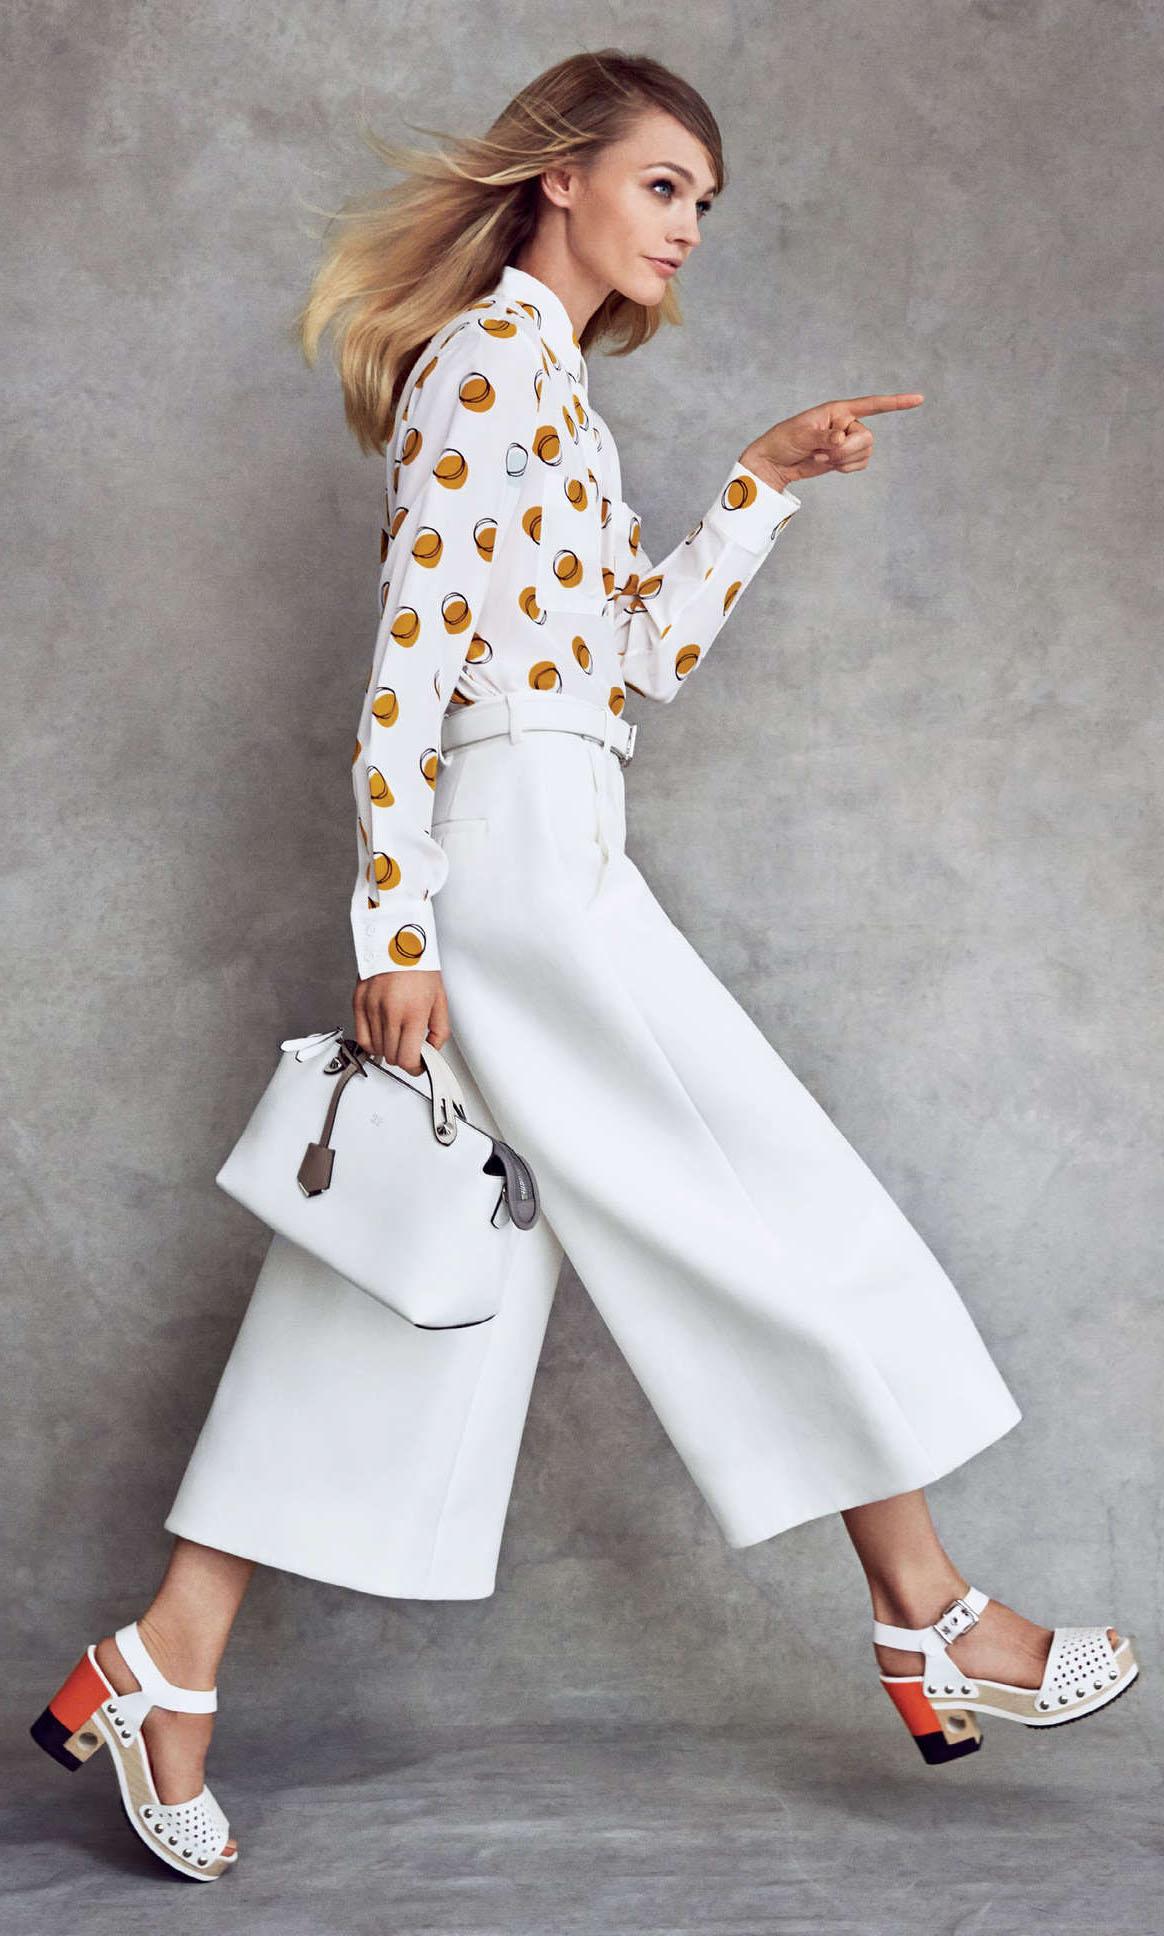 white-culottes-pants-white-collared-shirt-print-white-bag-mono-white-shoe-sandalw-blonde-spring-summer-work.jpg